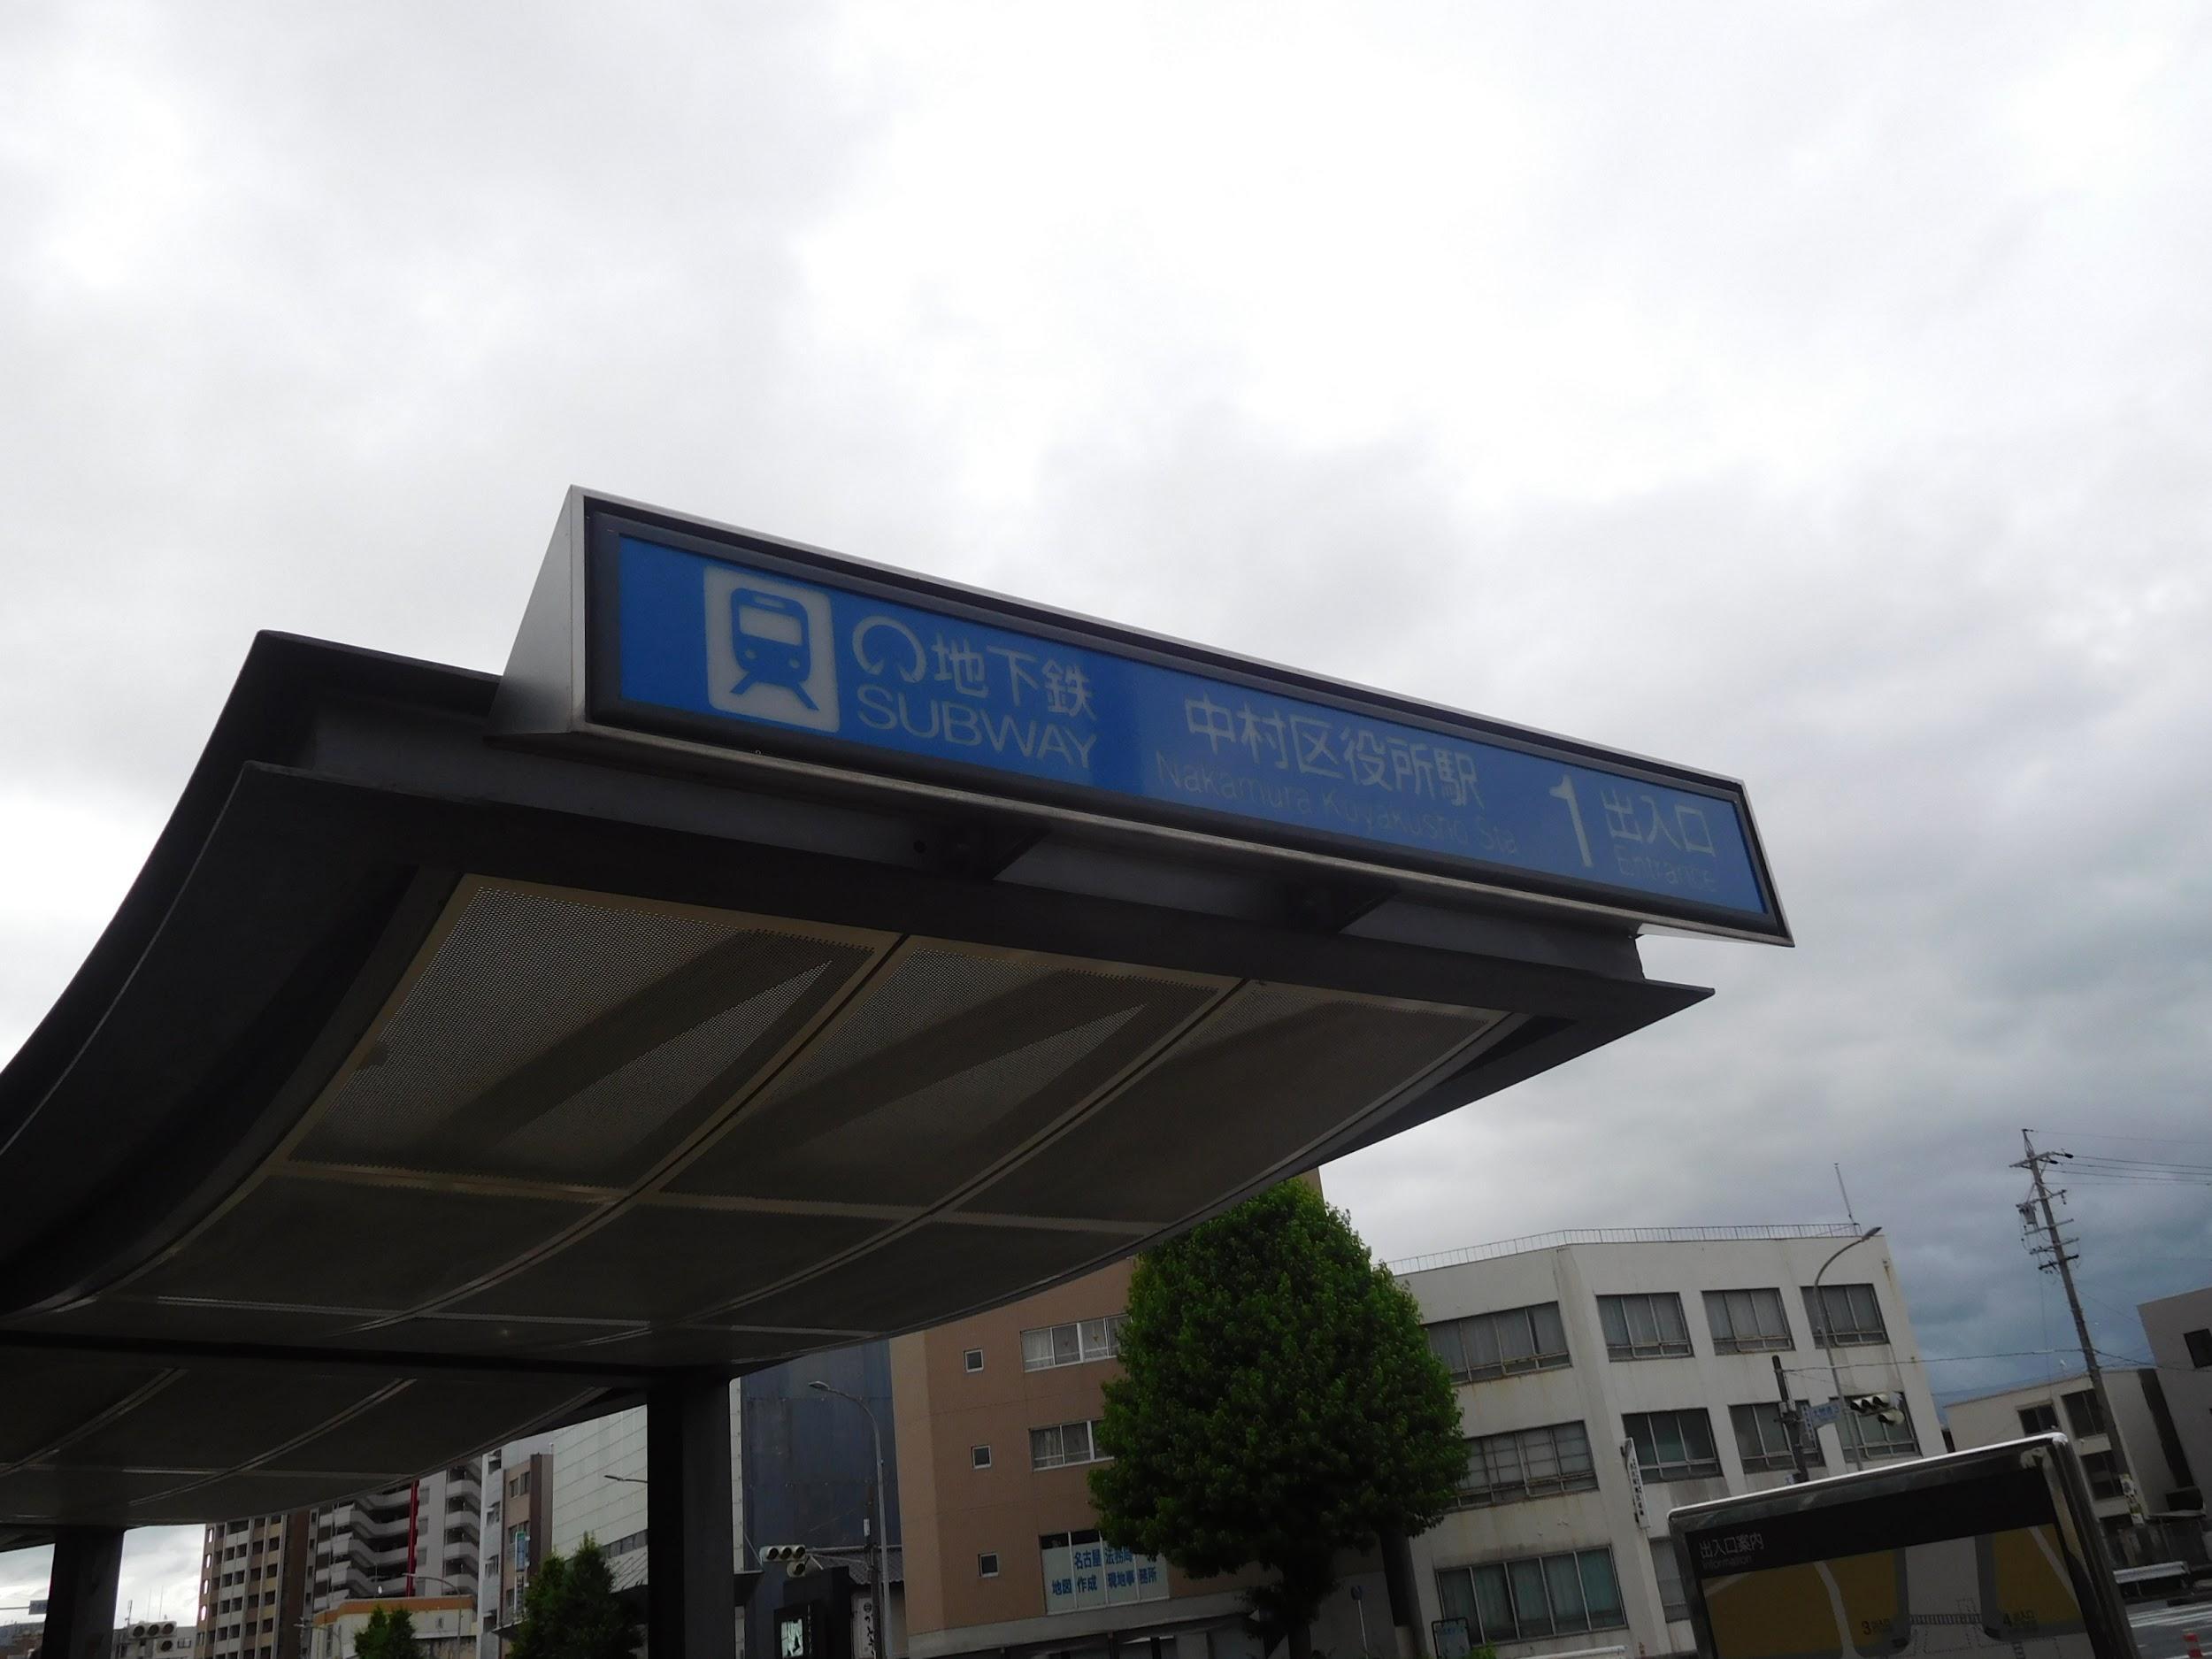 地下鉄桜通線の西の終点・中村区役所駅1番出口